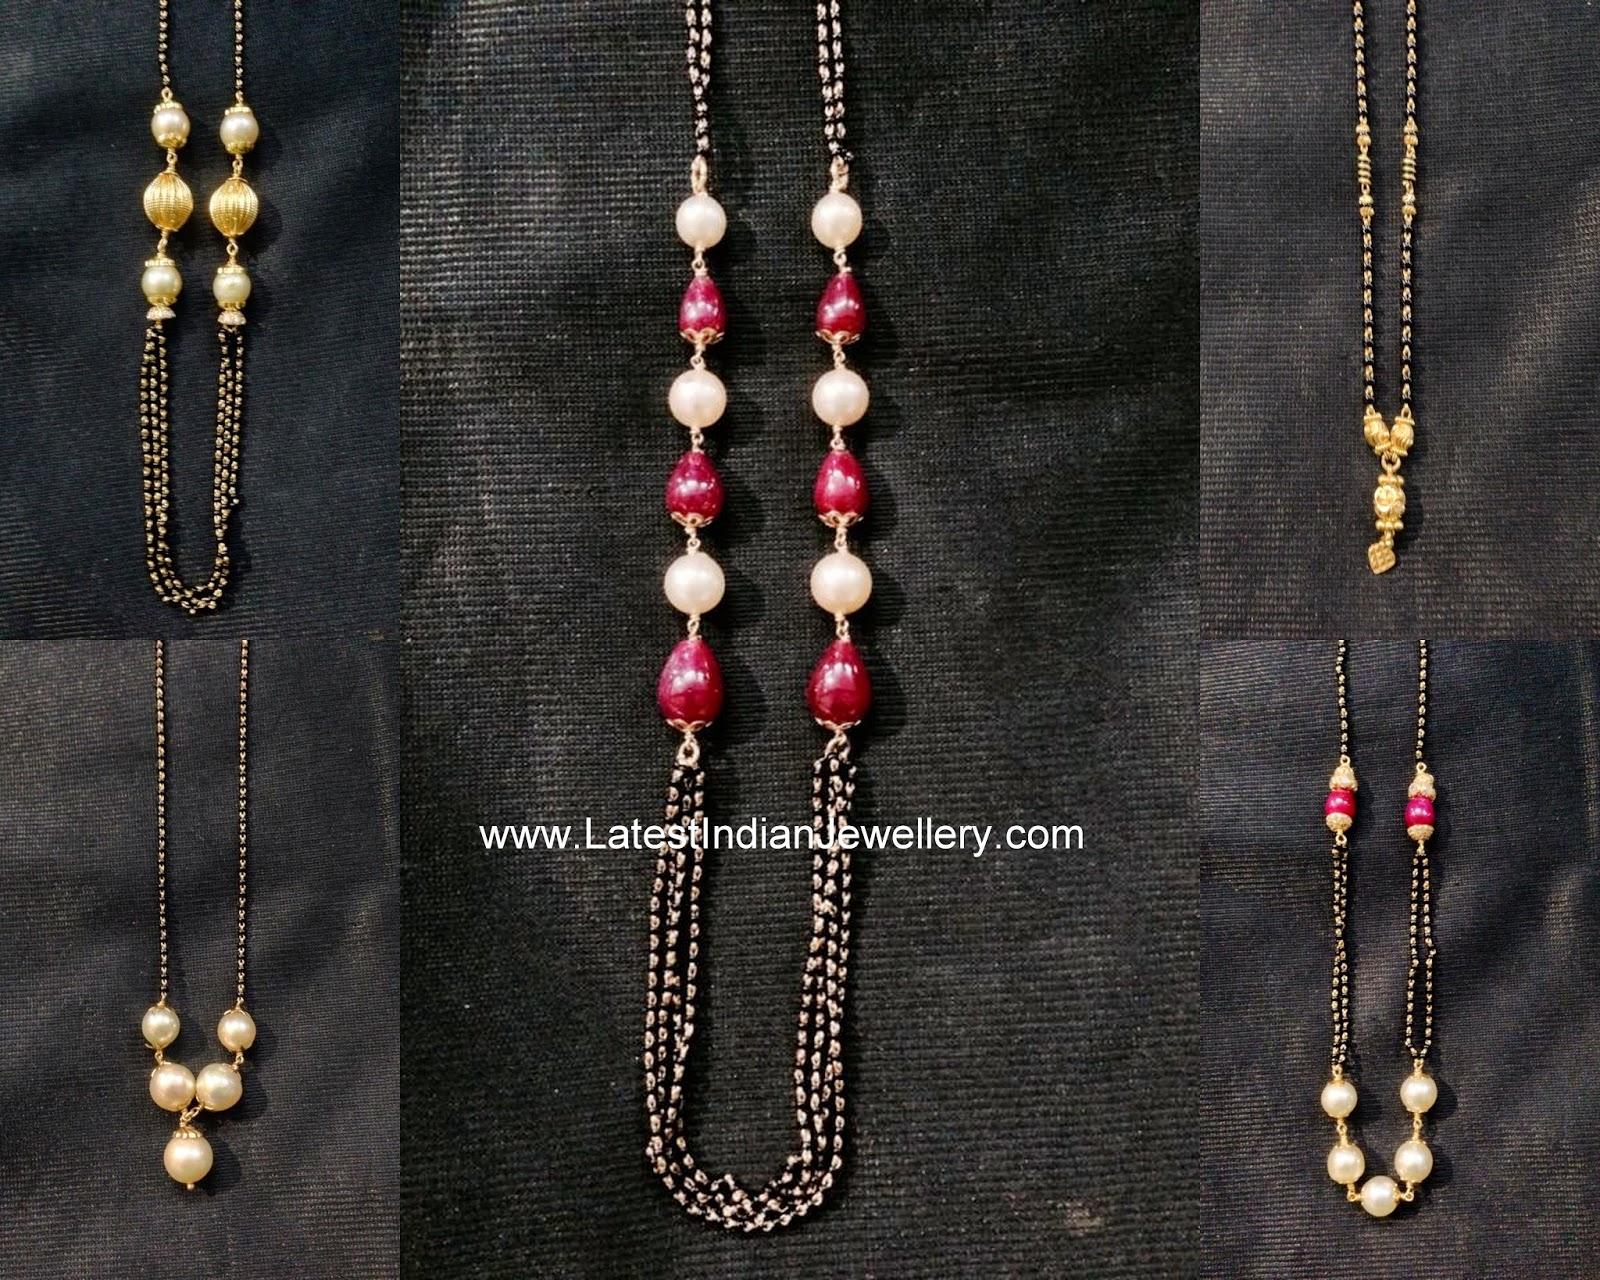 light weight black beads chain